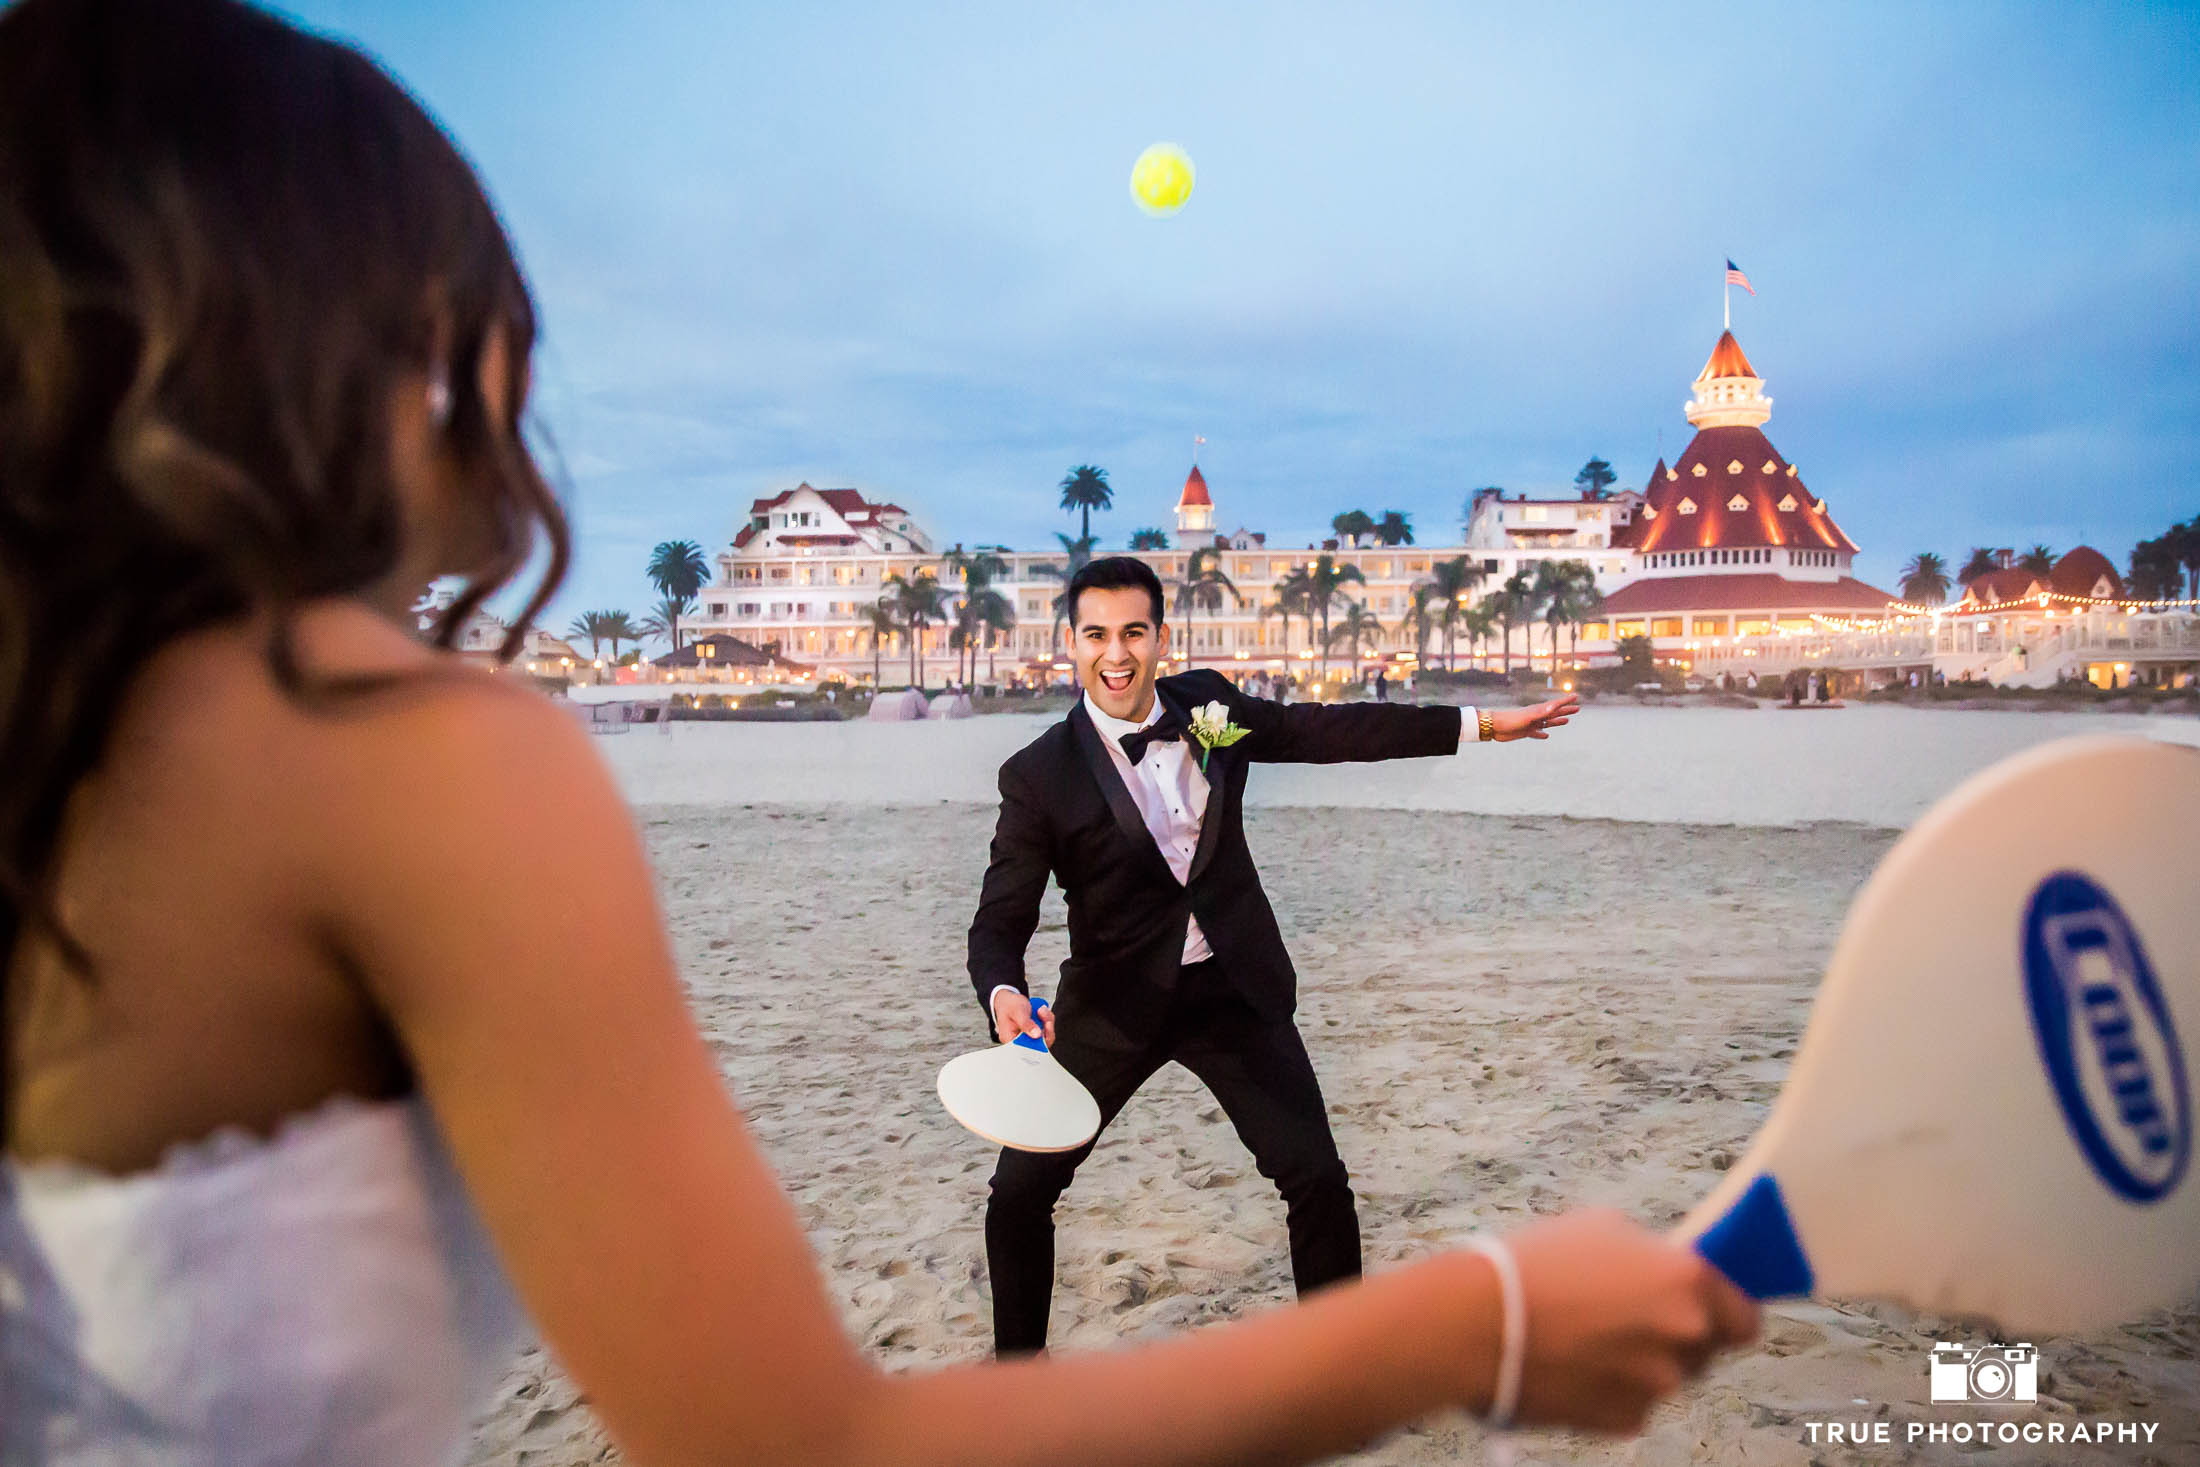 Groom's fun reaction to playing with Bride at Hotel Del Coronado